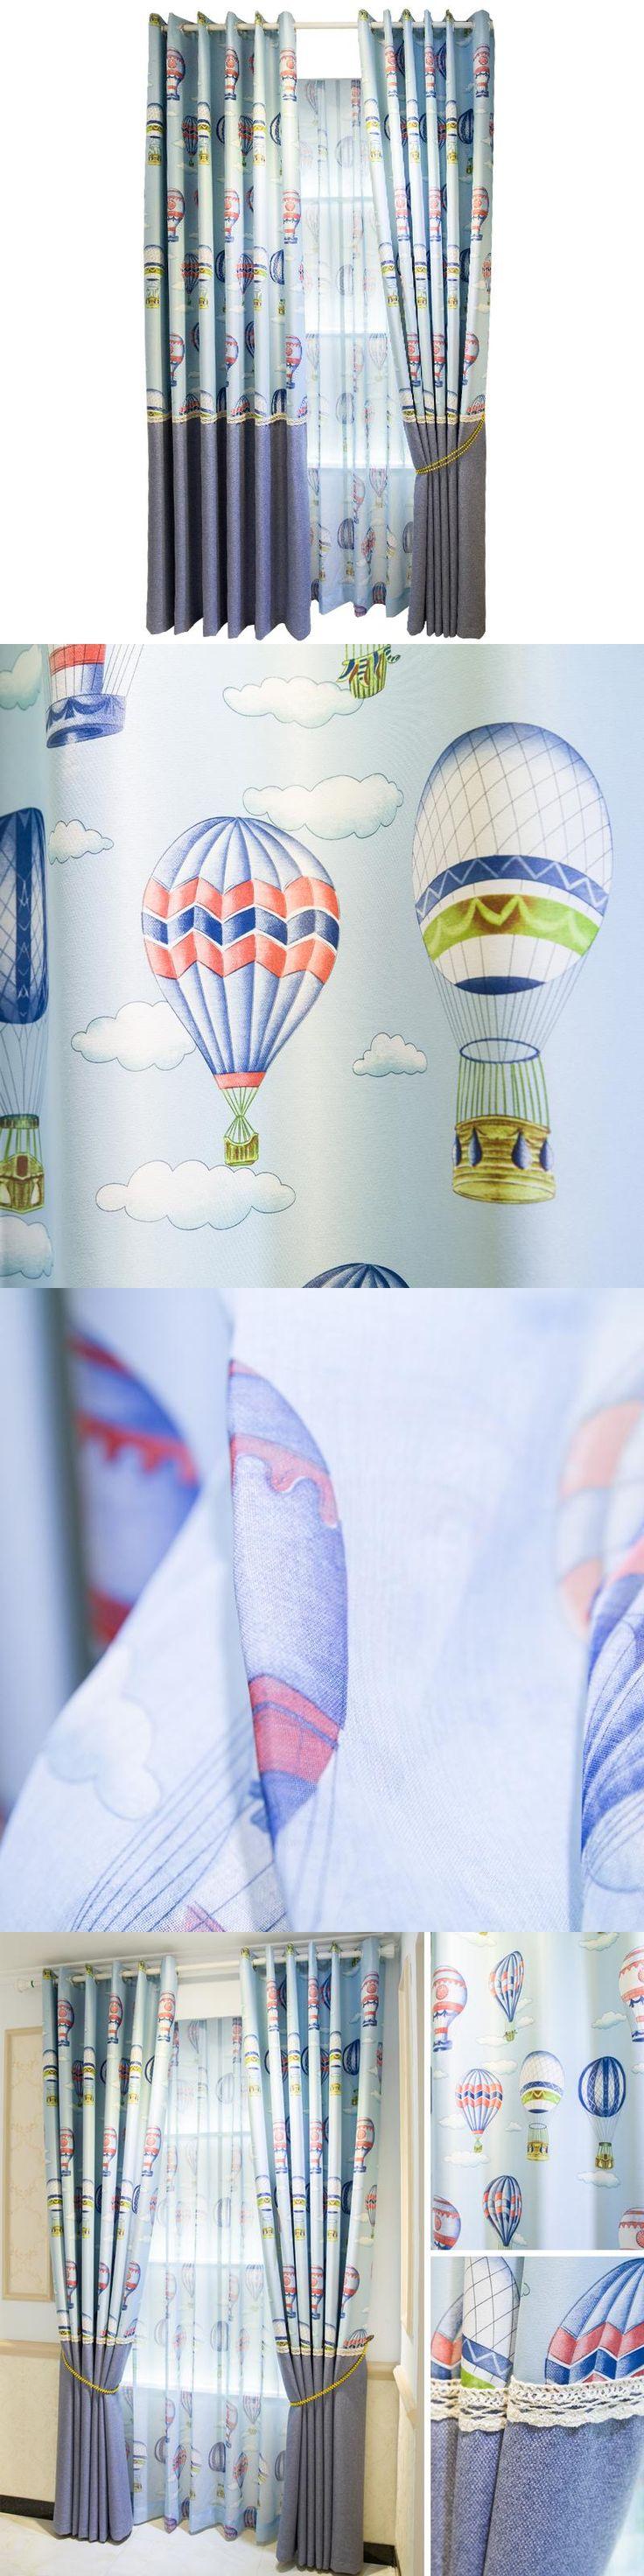 Blackout Curtains Free Shipping!Blue Balloon Mediterranean Style Children's Room Curtain.